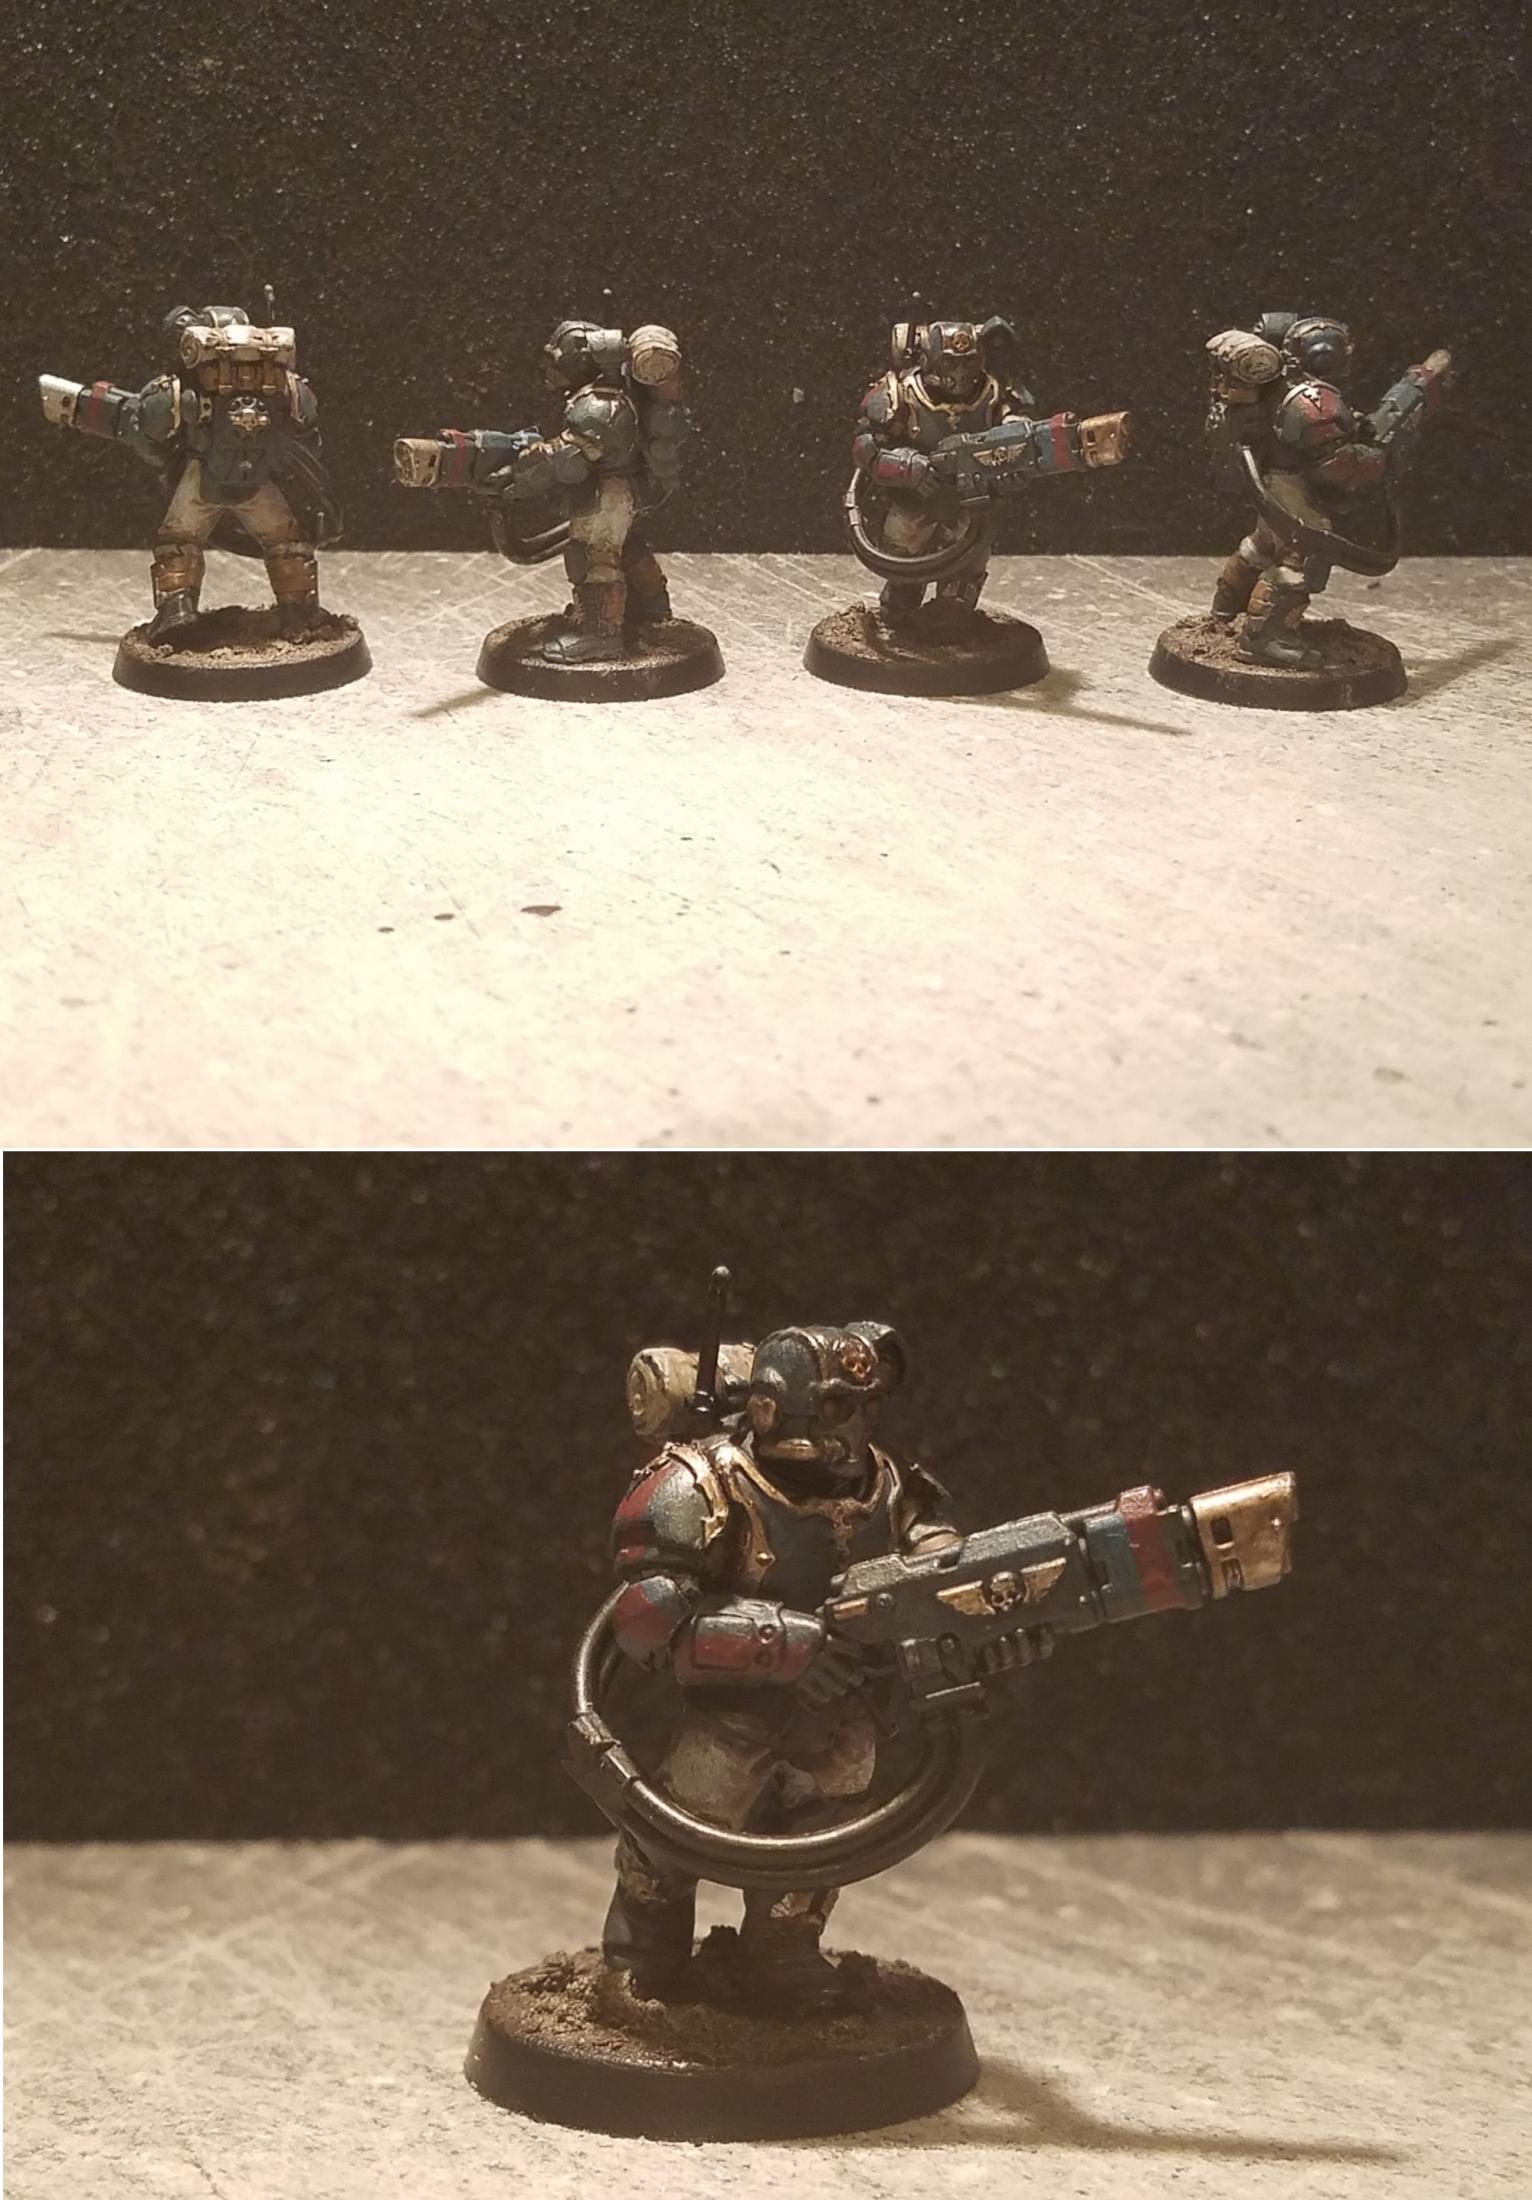 Astra Militarum, Imperial Guard, Militarum Tempestus, Scions, Warhammer 40,000